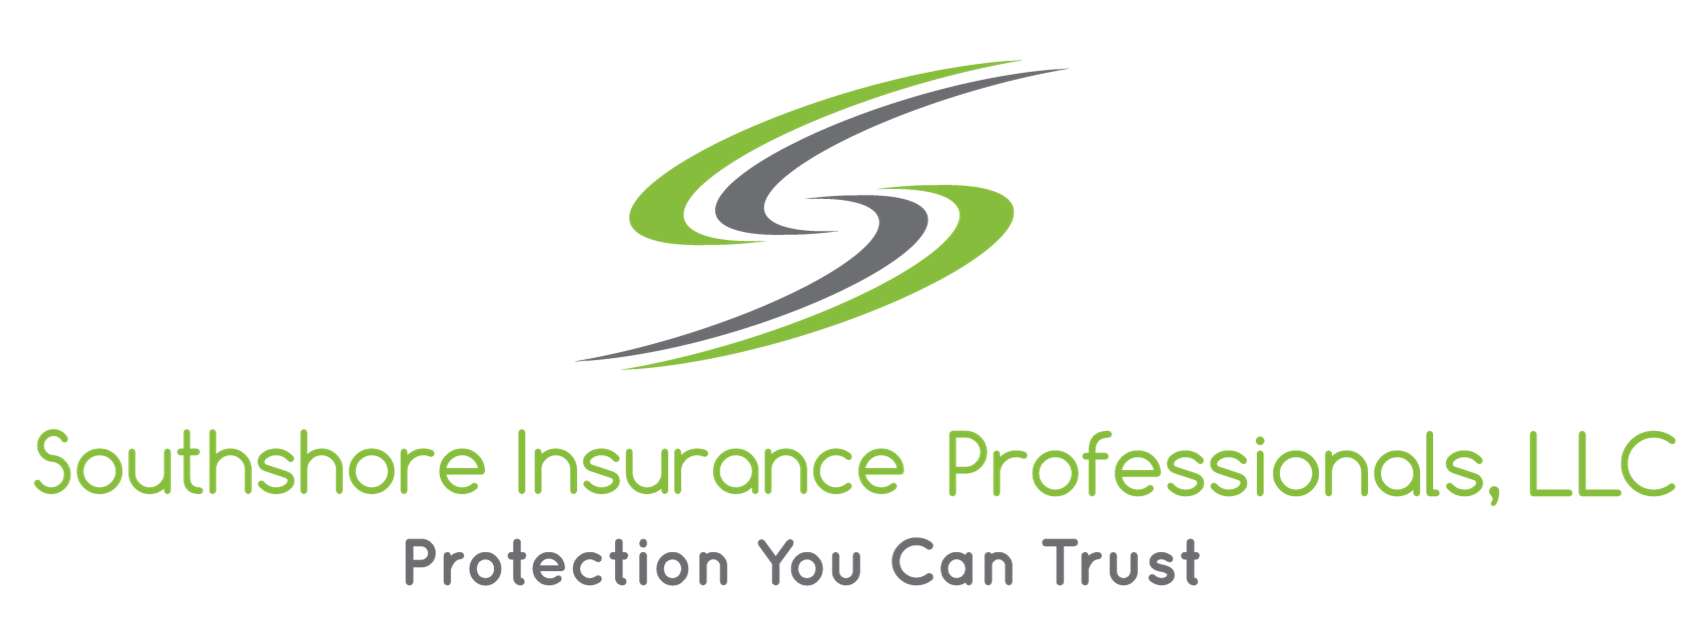 Southshore-Insurance-Professionals-1.png